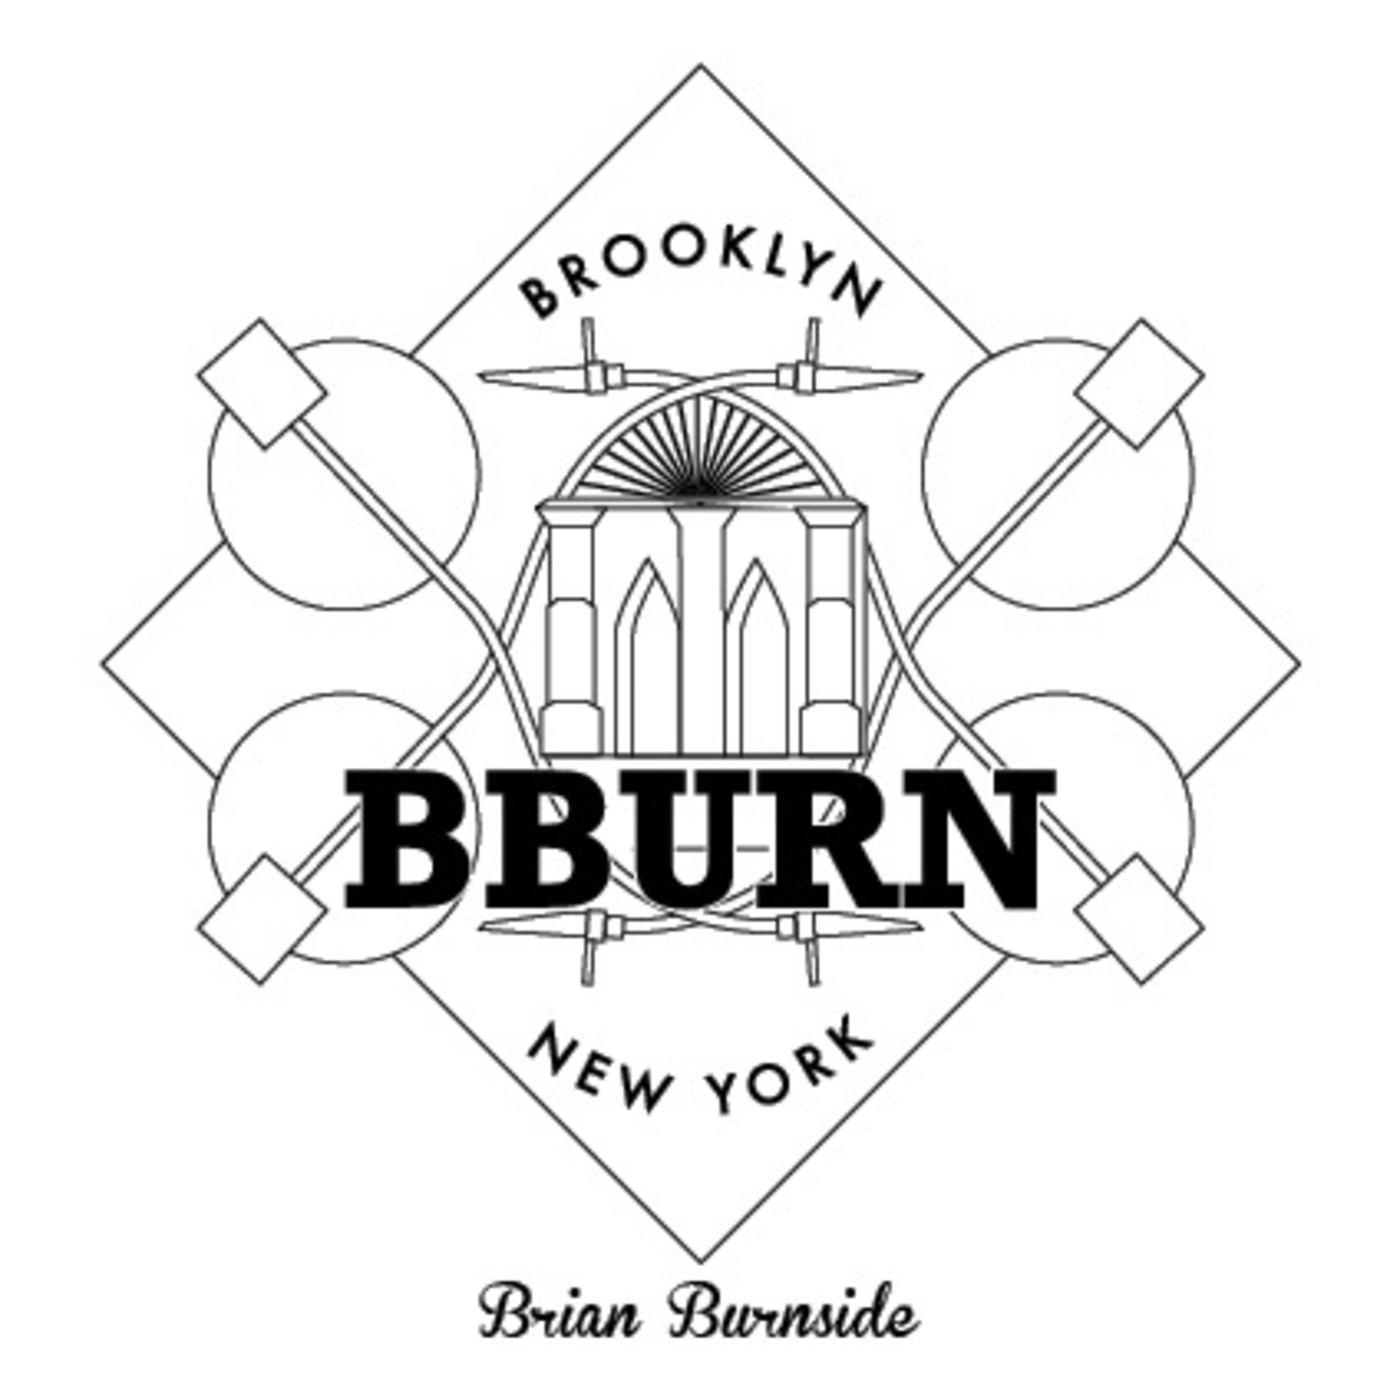 Brian burnside 002